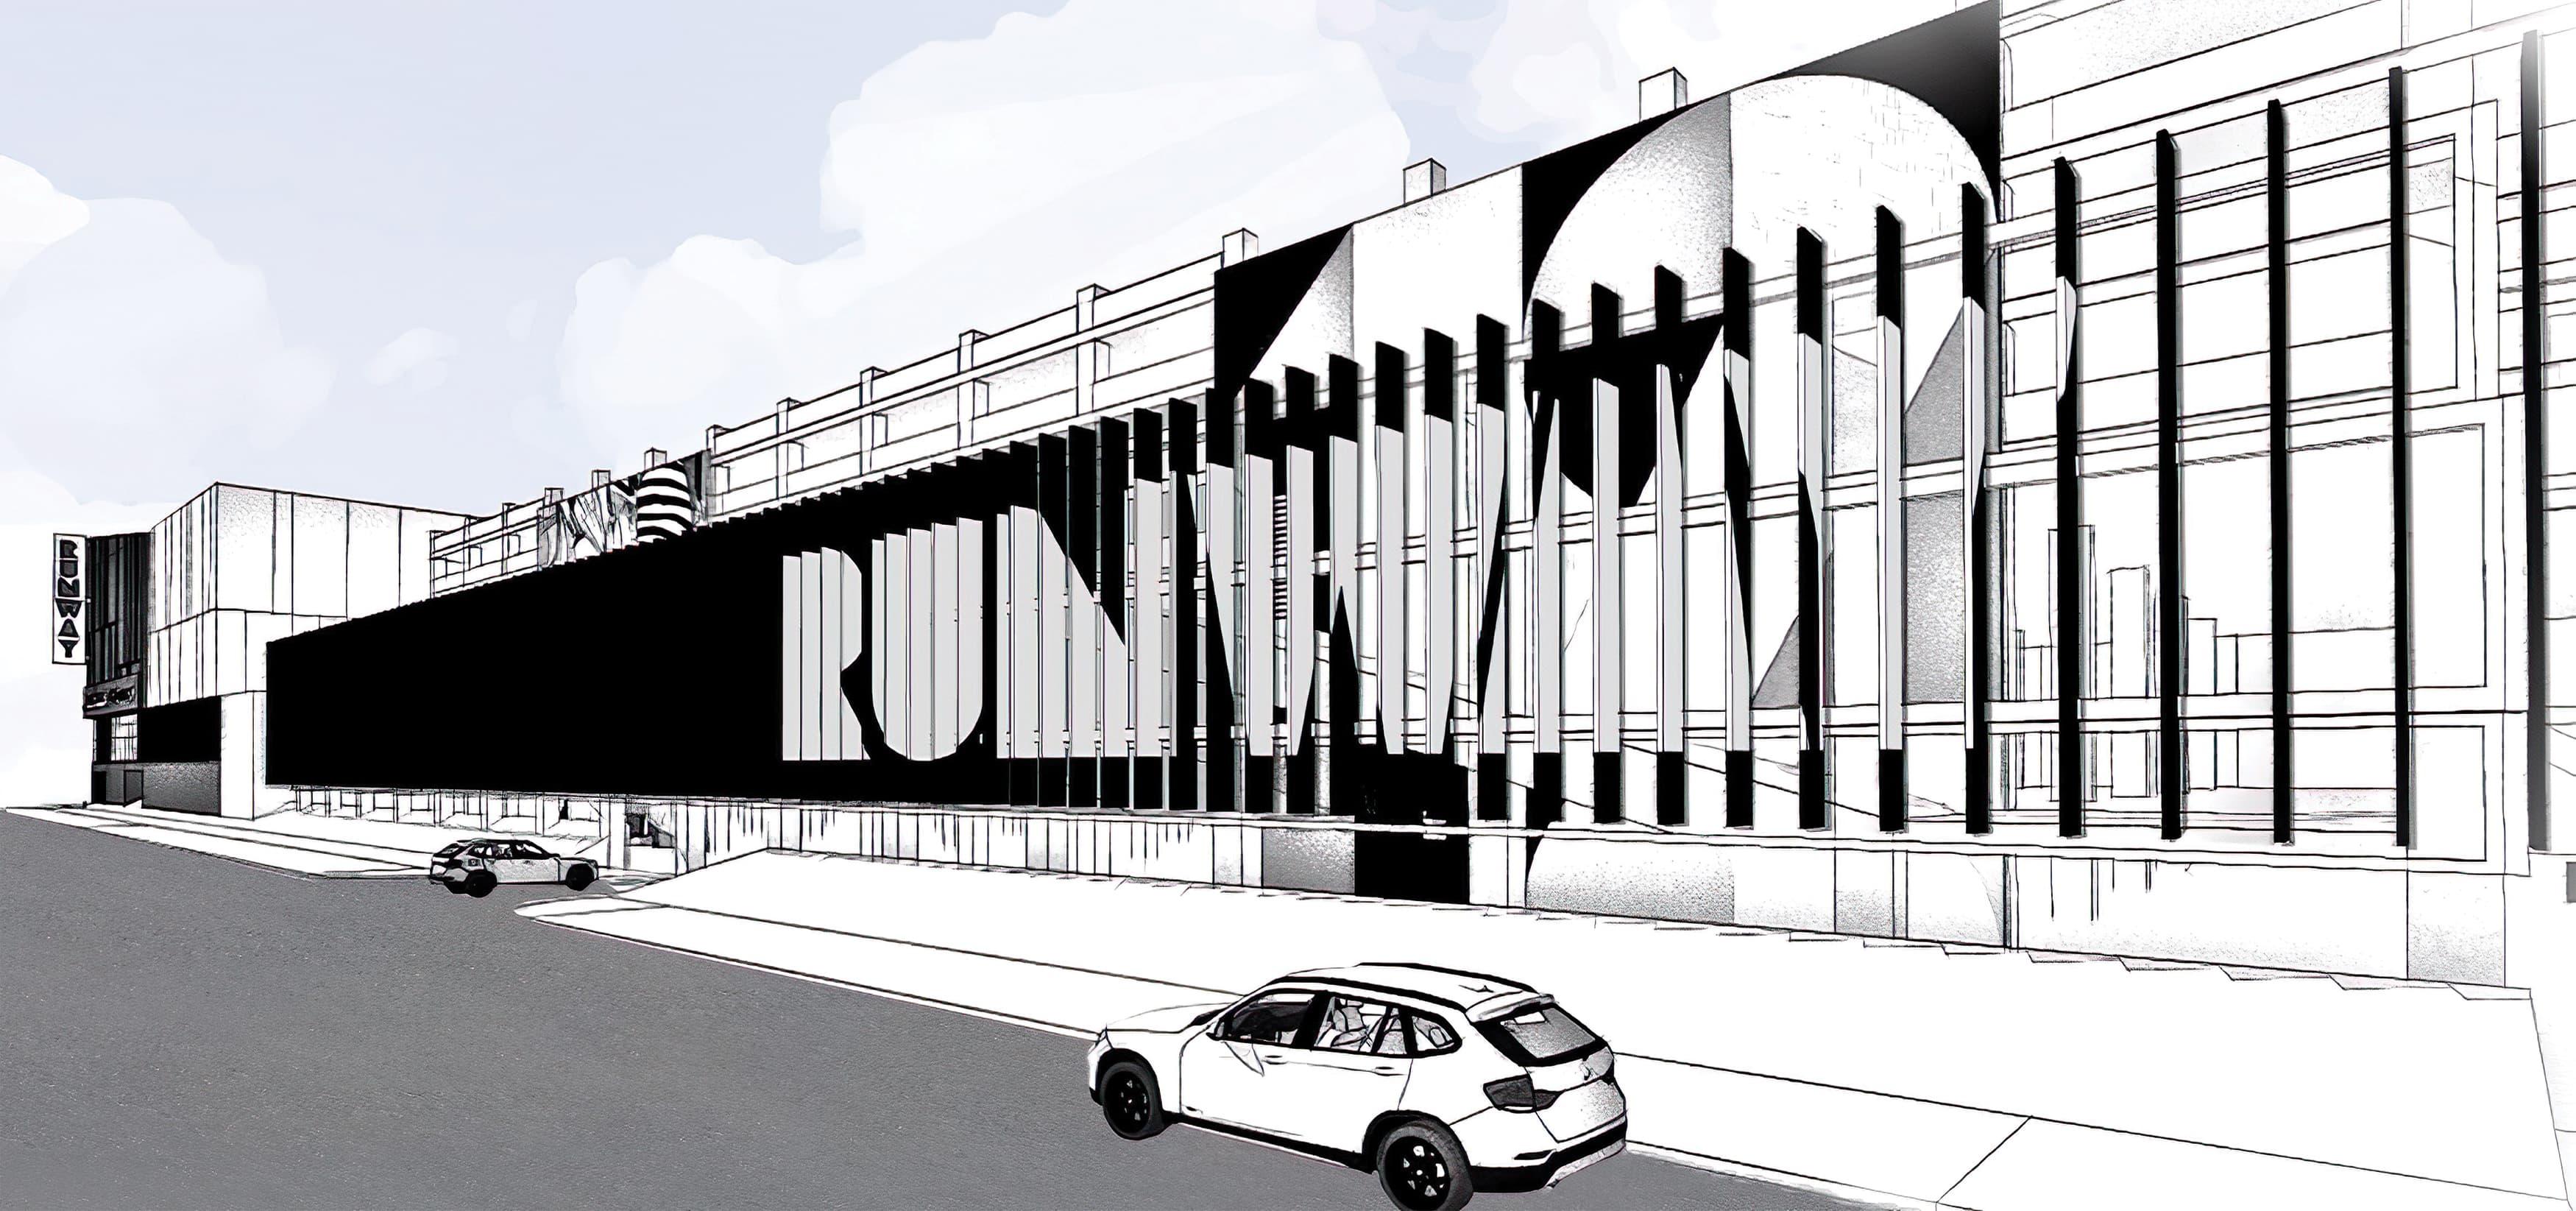 RSM Design worked to prepare Public Art, Murals, Environmental Graphic Design, and Wayfinding Signage for Runway Playa Vista, a retail development in Playa Vista, Los Angeles, California.